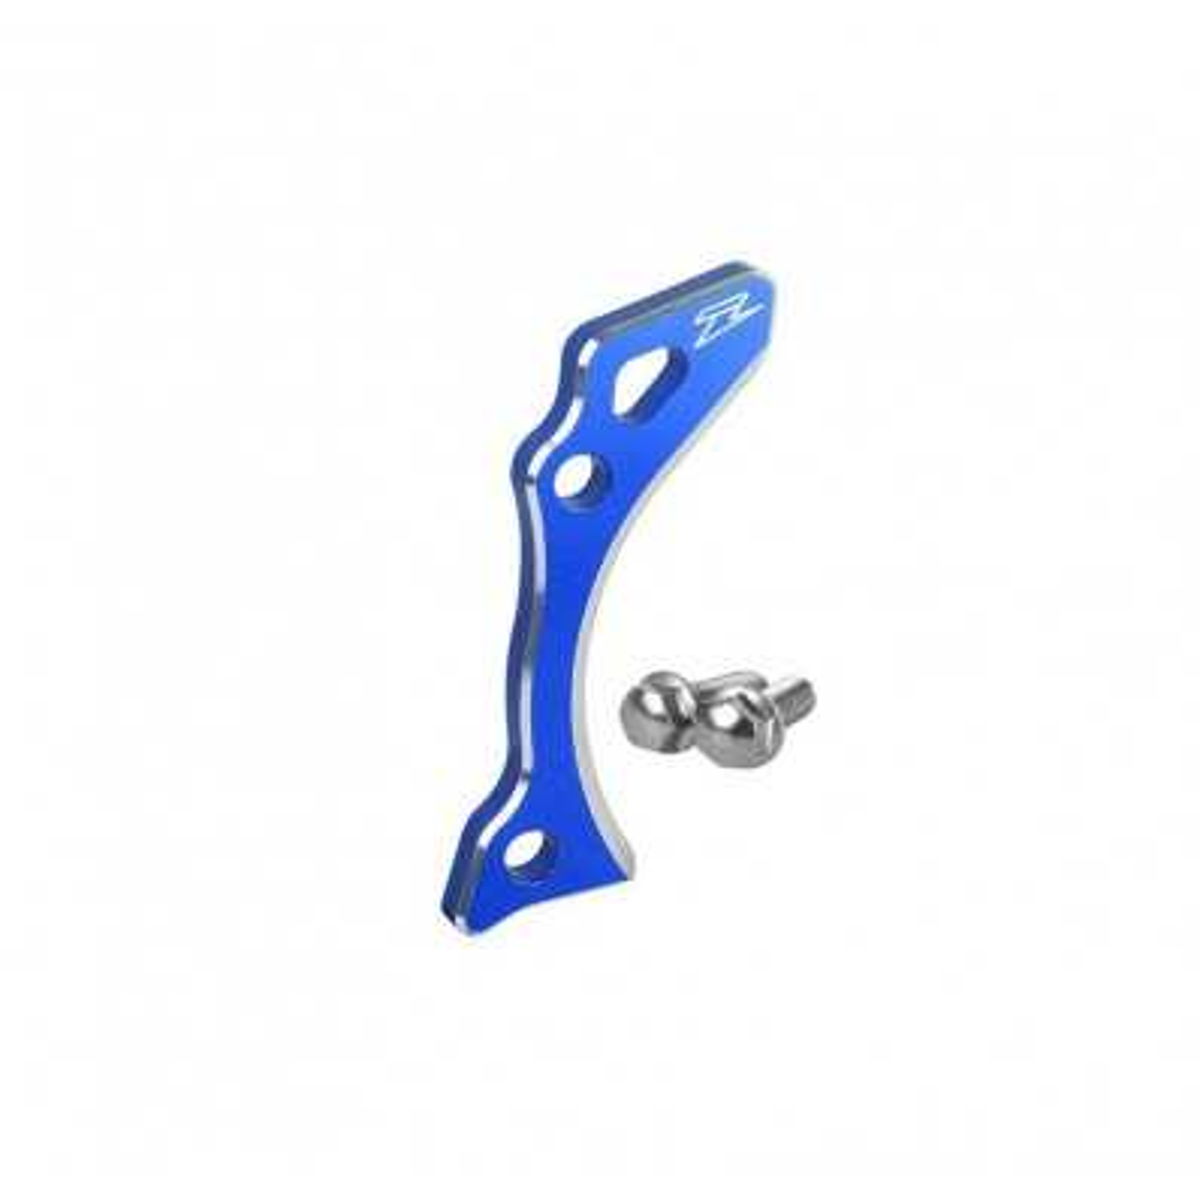 ZE80.7106 - Protector Caja Zeta Kx250F´17-,Kx450F´16 Azul